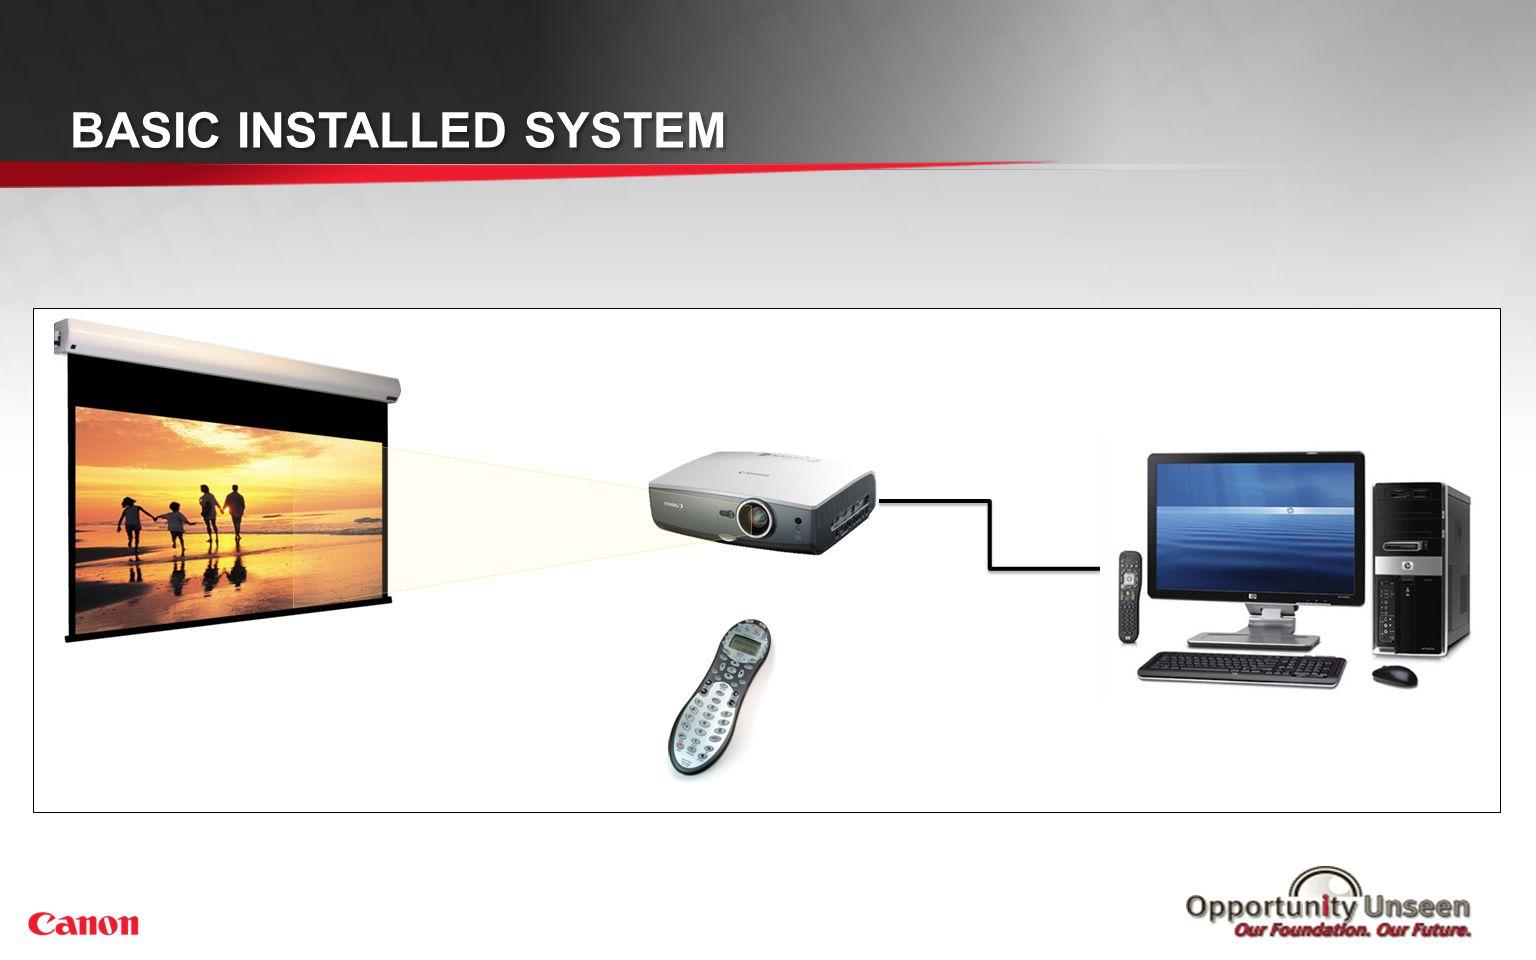 BASIC INSTALLED SYSTEM